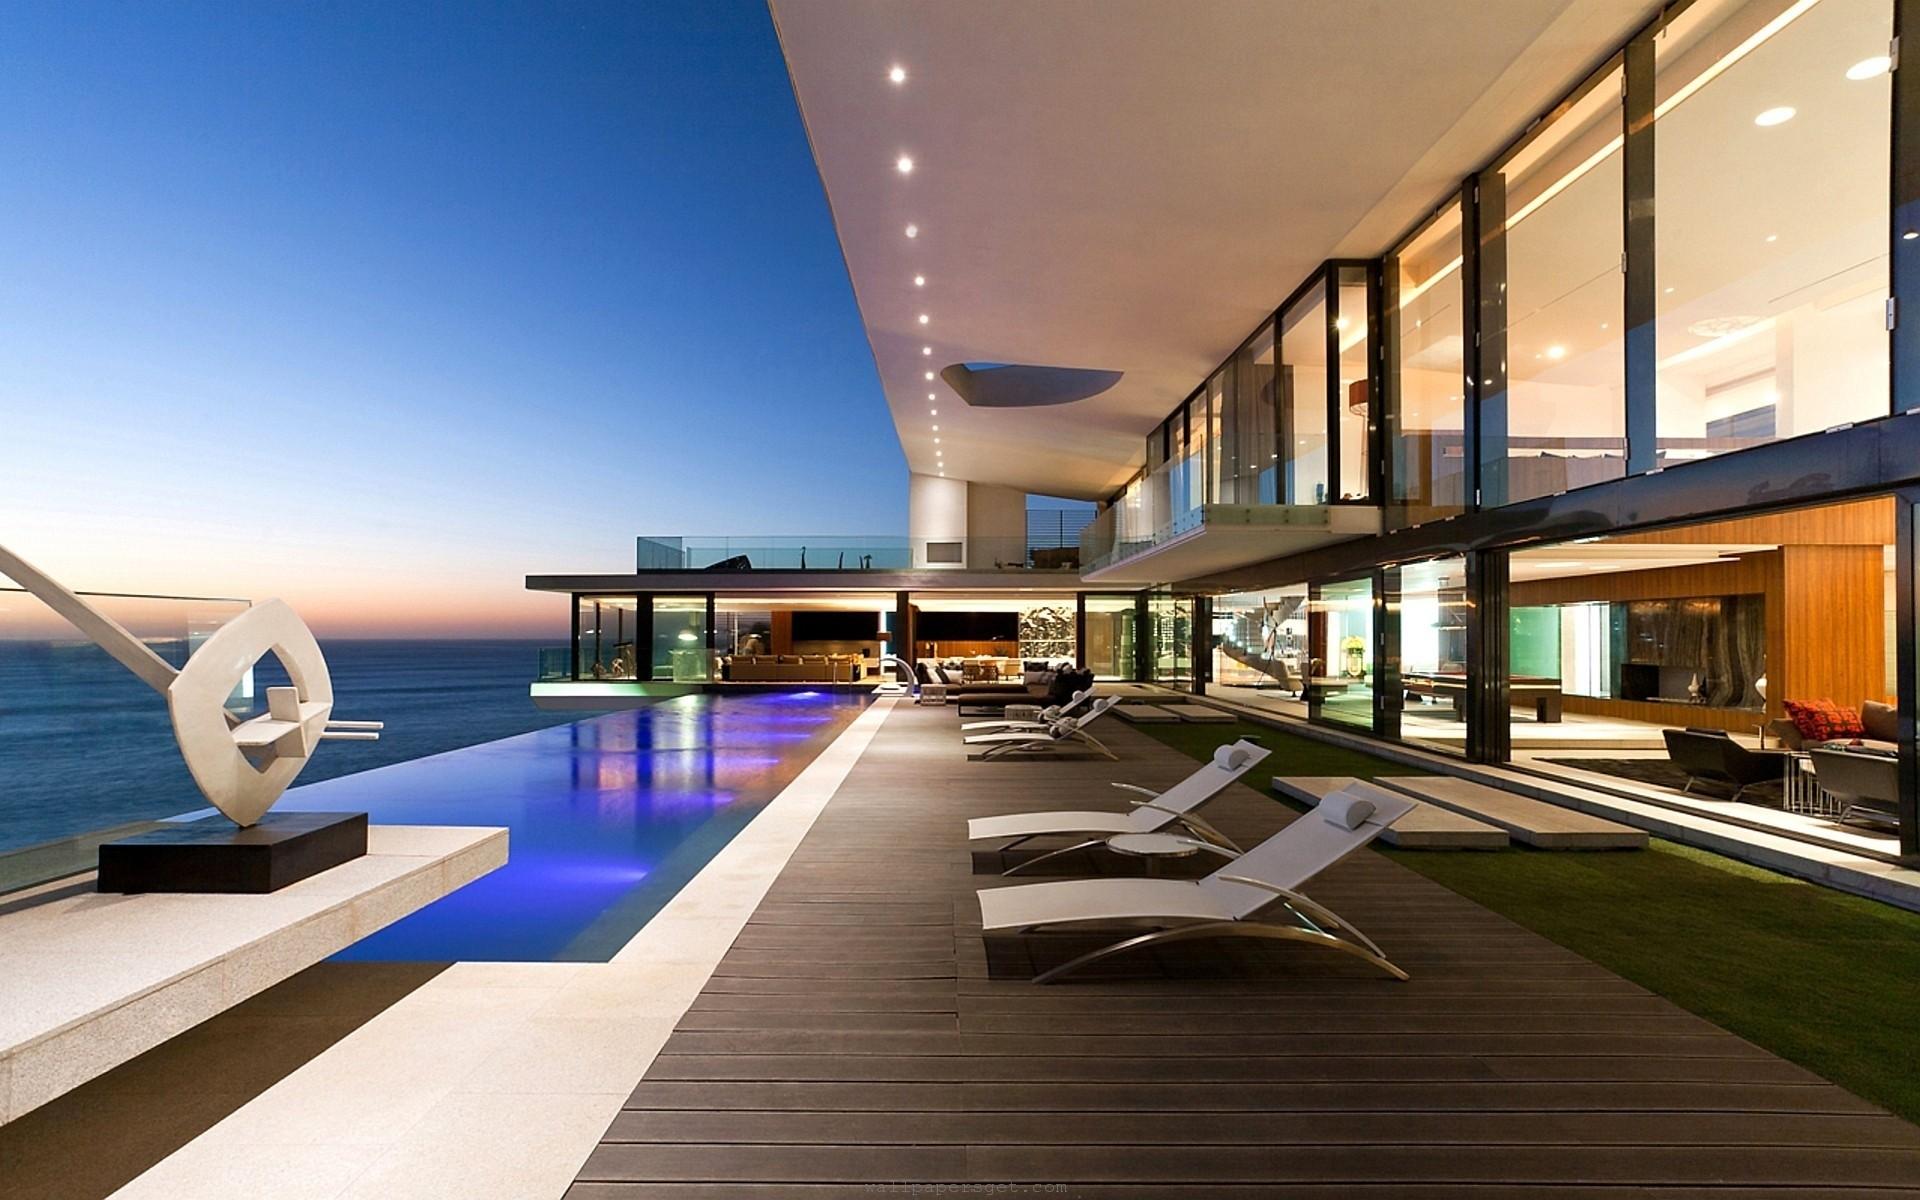 house_by_the_ocean_beach_luxury_hd-wallpaper-1451083